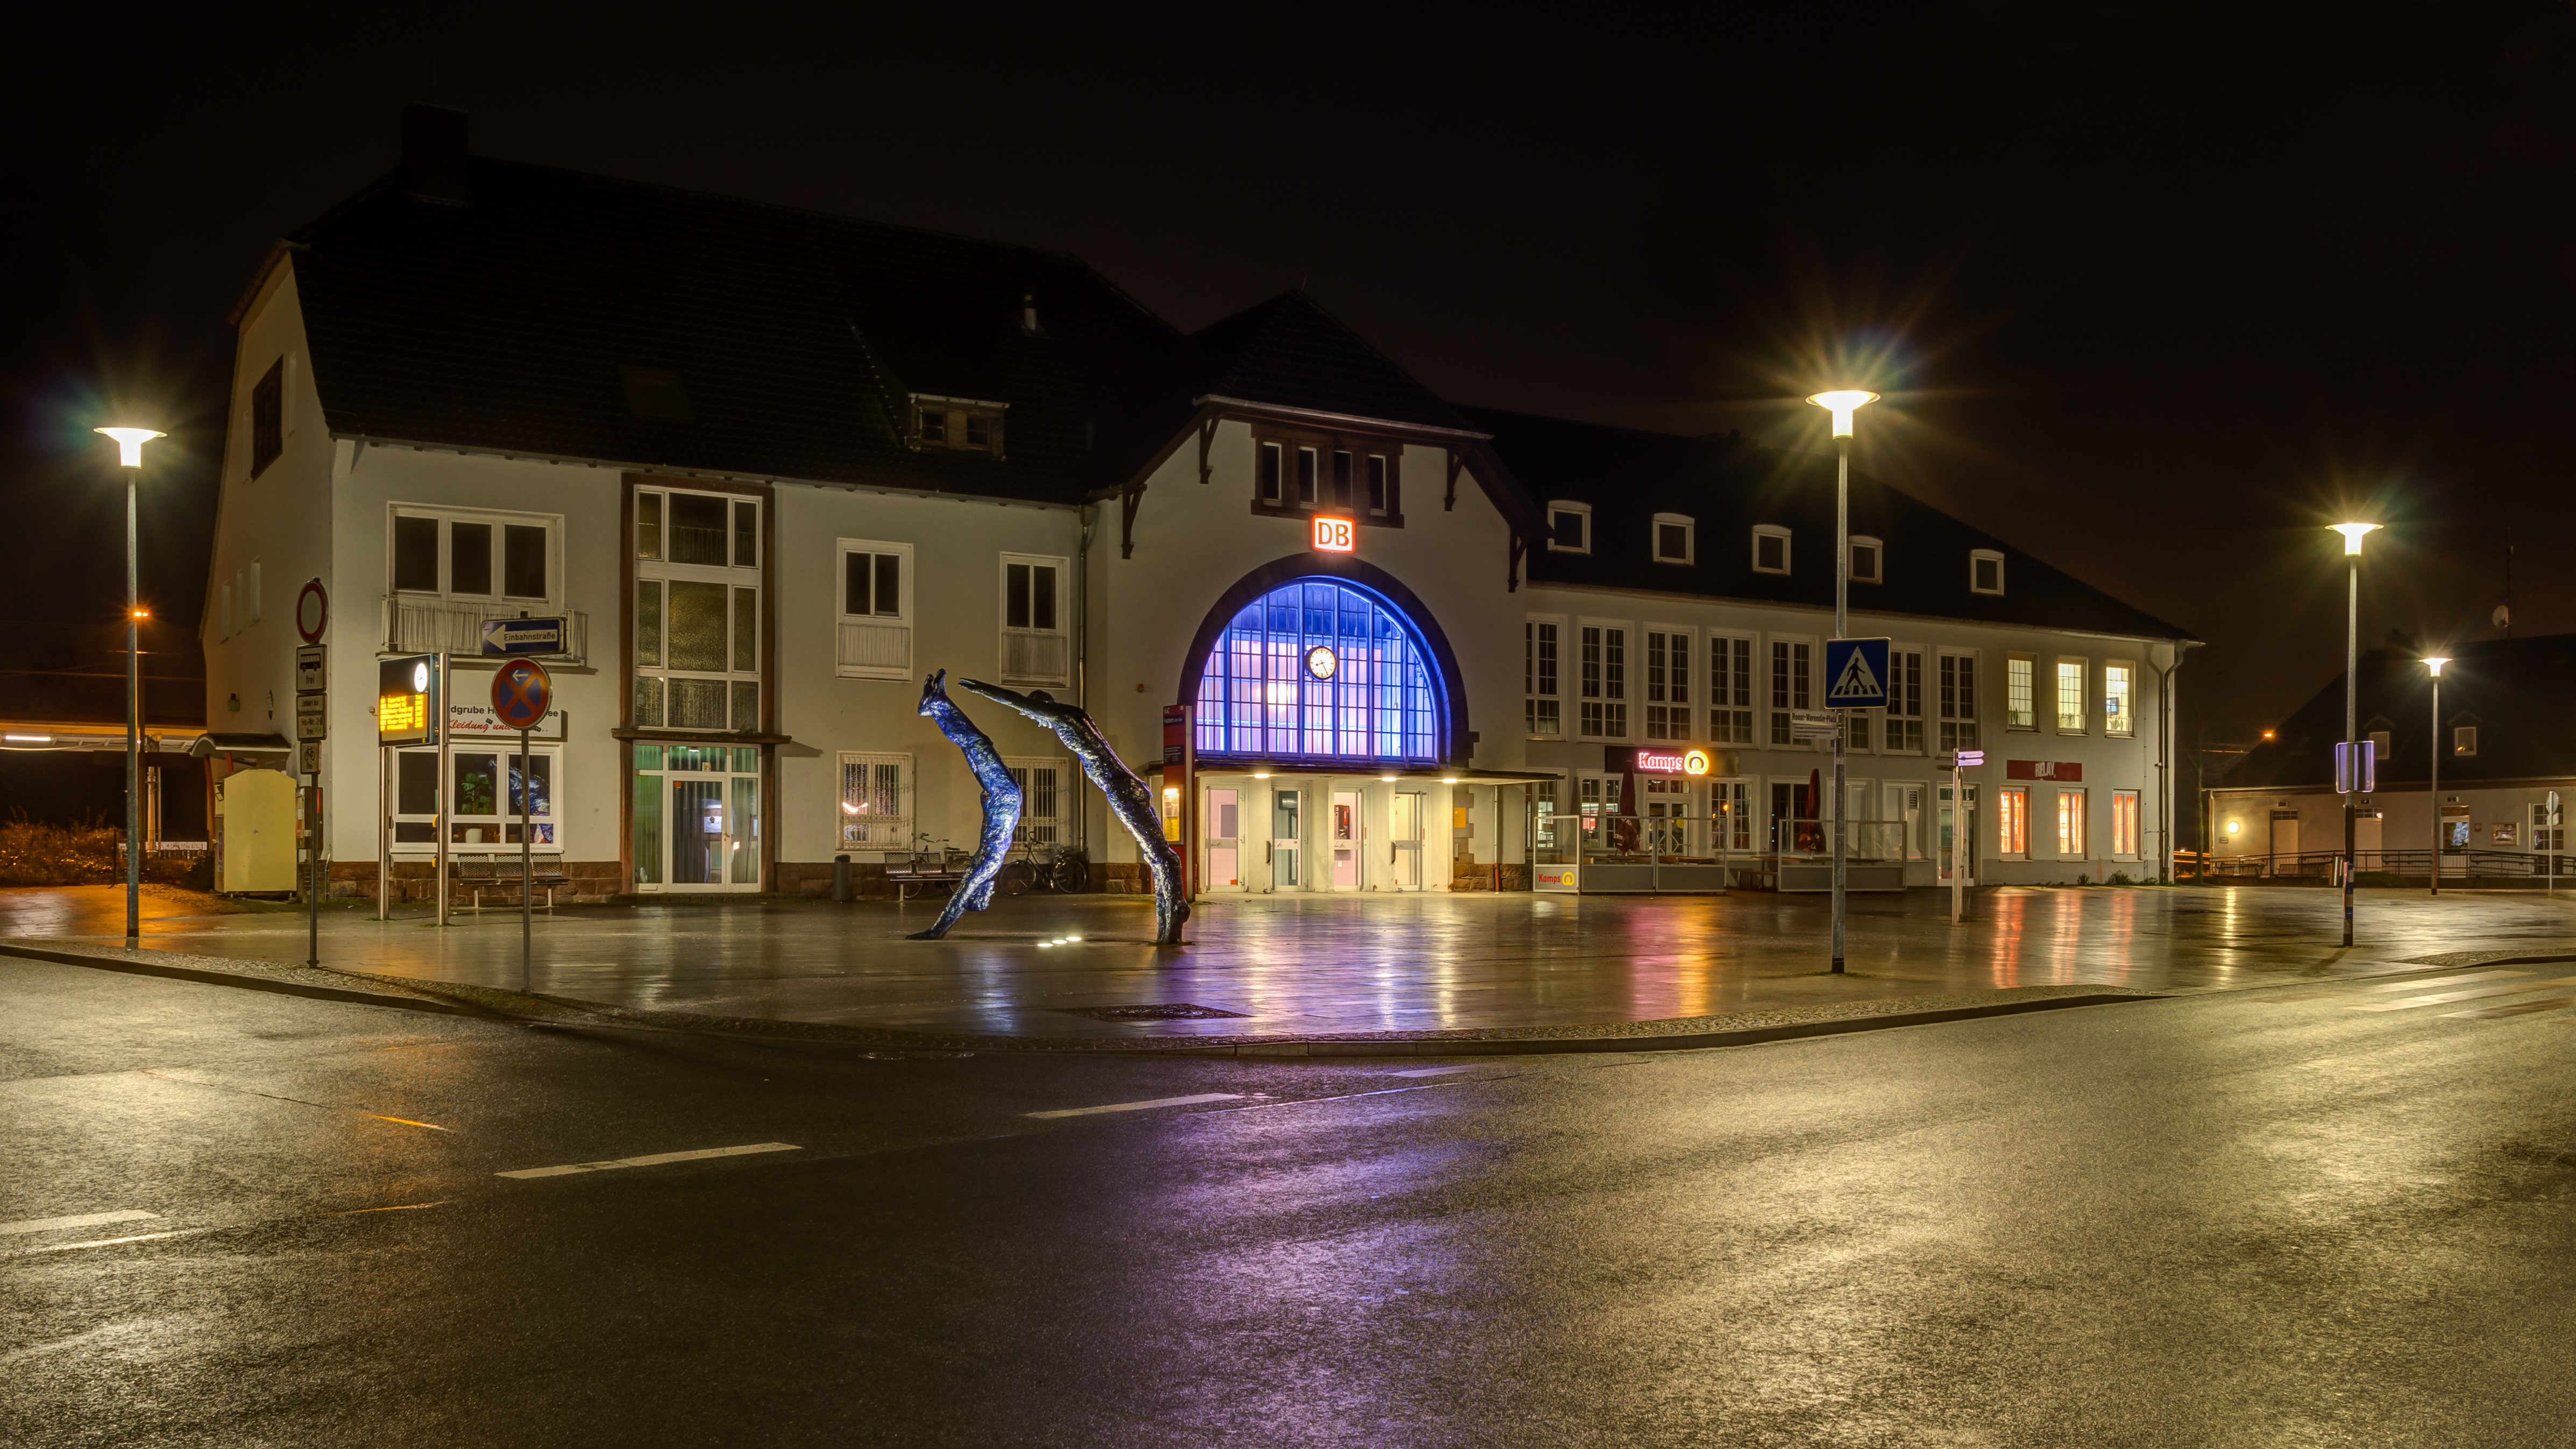 File:Haltern am See, Bahnhof -- 2016 -- 0438-44.jpg ...